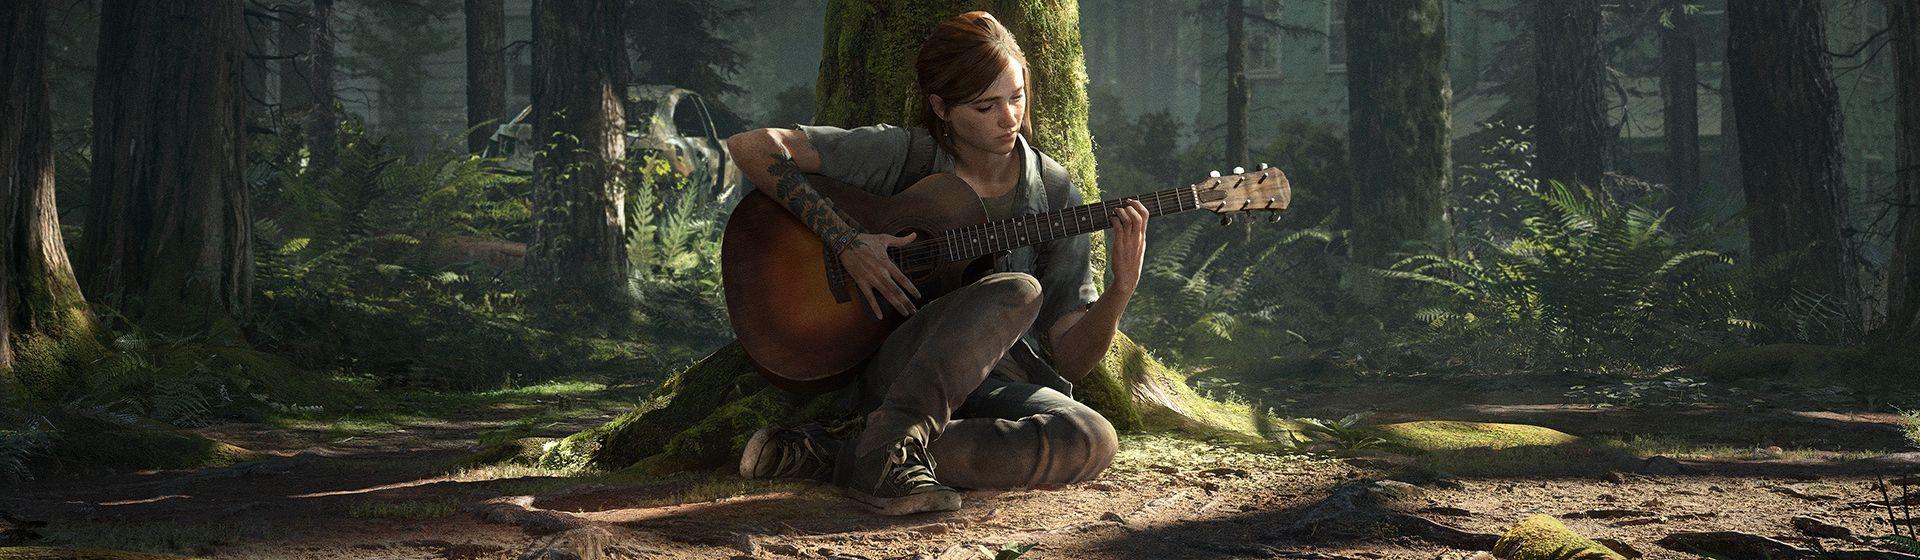 PS4 Pro ganha bundle com The Last of Us Part 2; veja preço no Brasil